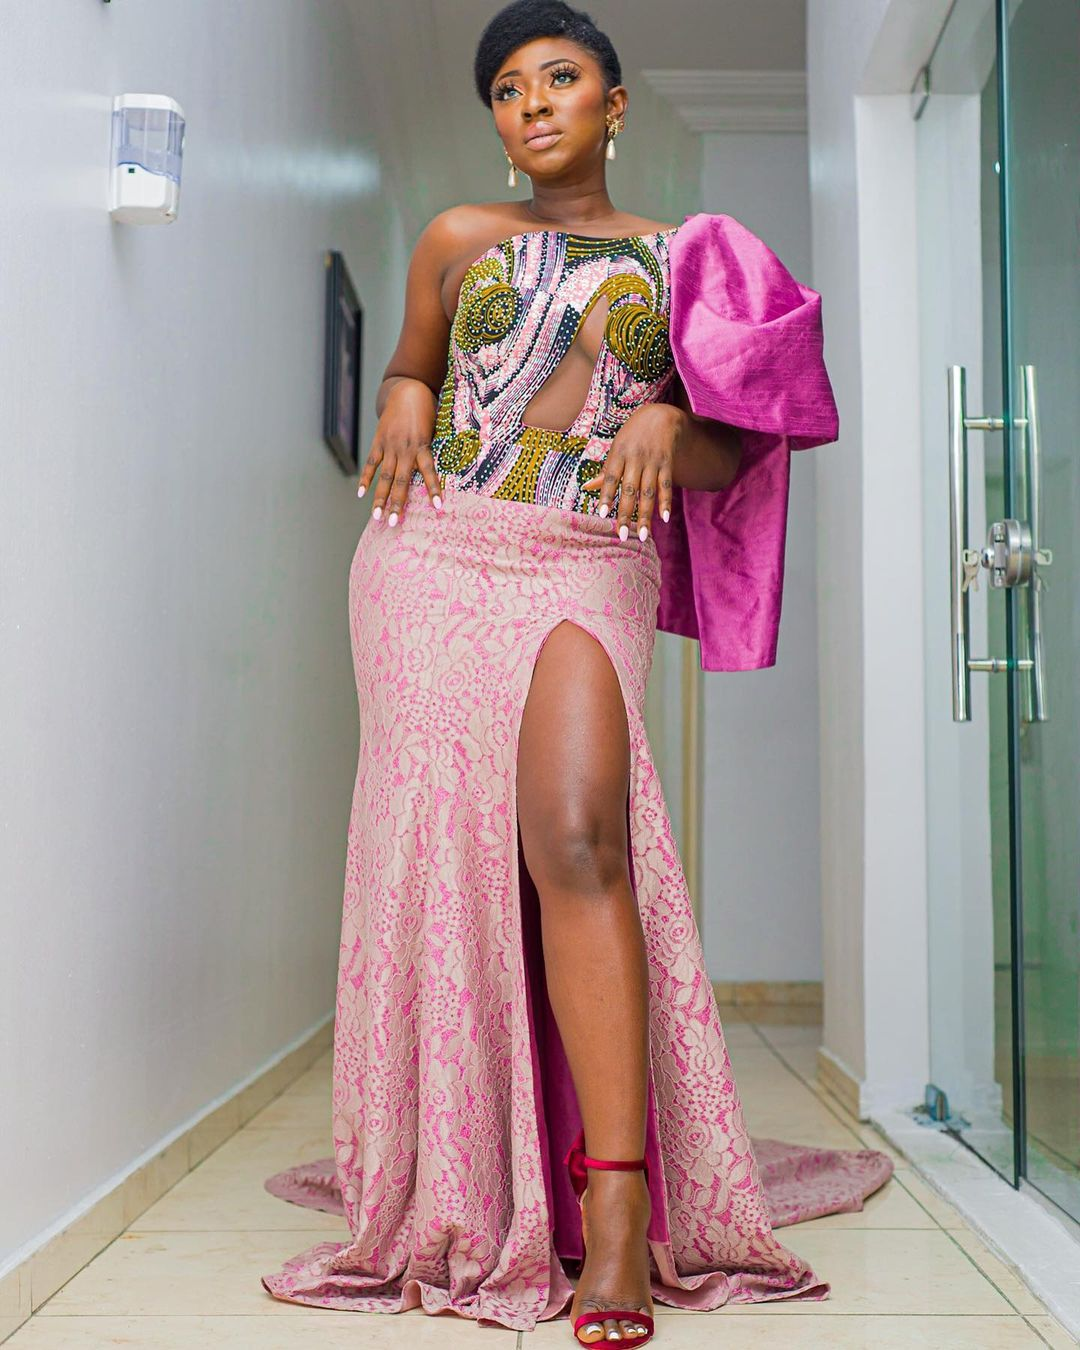 Yvonne Jegede instagram fashion